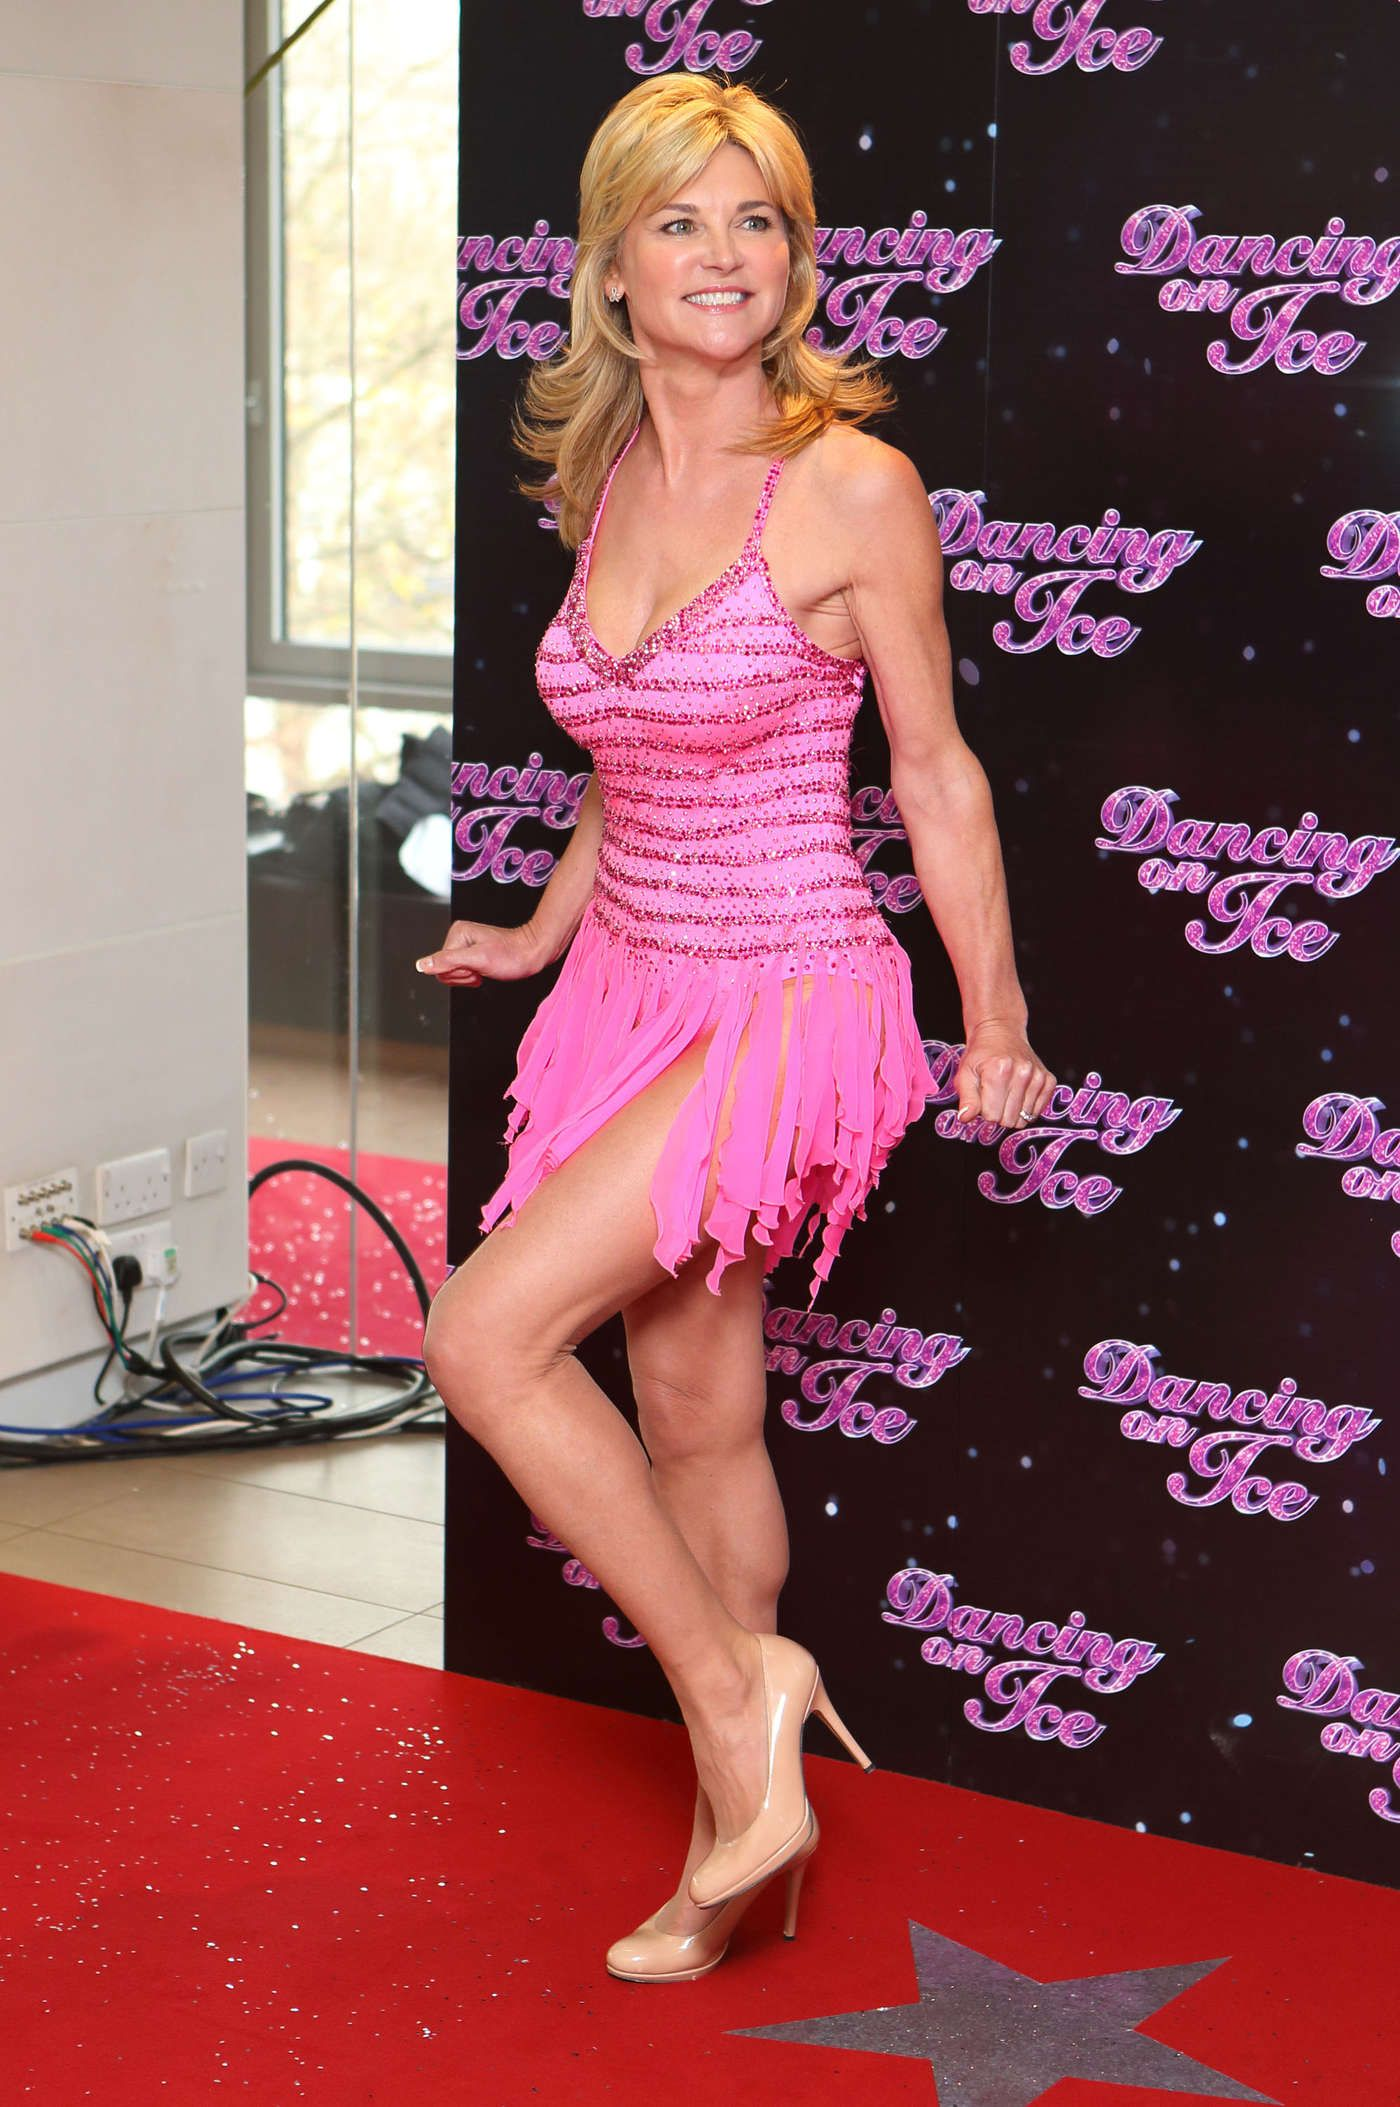 anthea Turner hot - Google Search | Anthea Turner | Hot, Celebrities, Ice dance